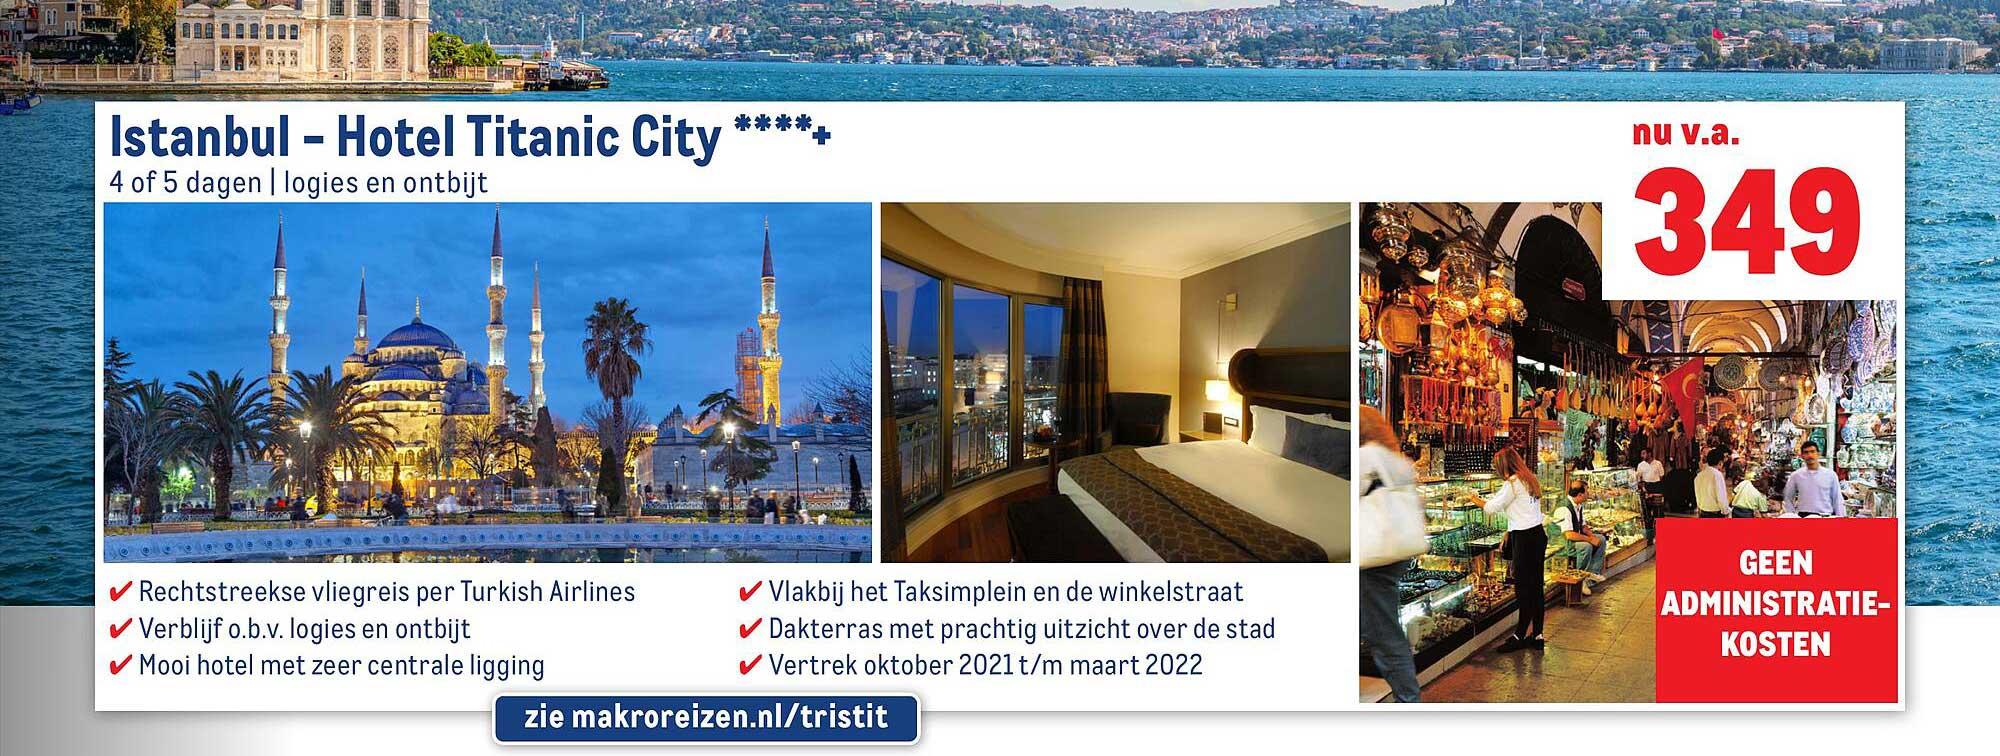 Makro Reizen Istanbul - Hotel Titanic City